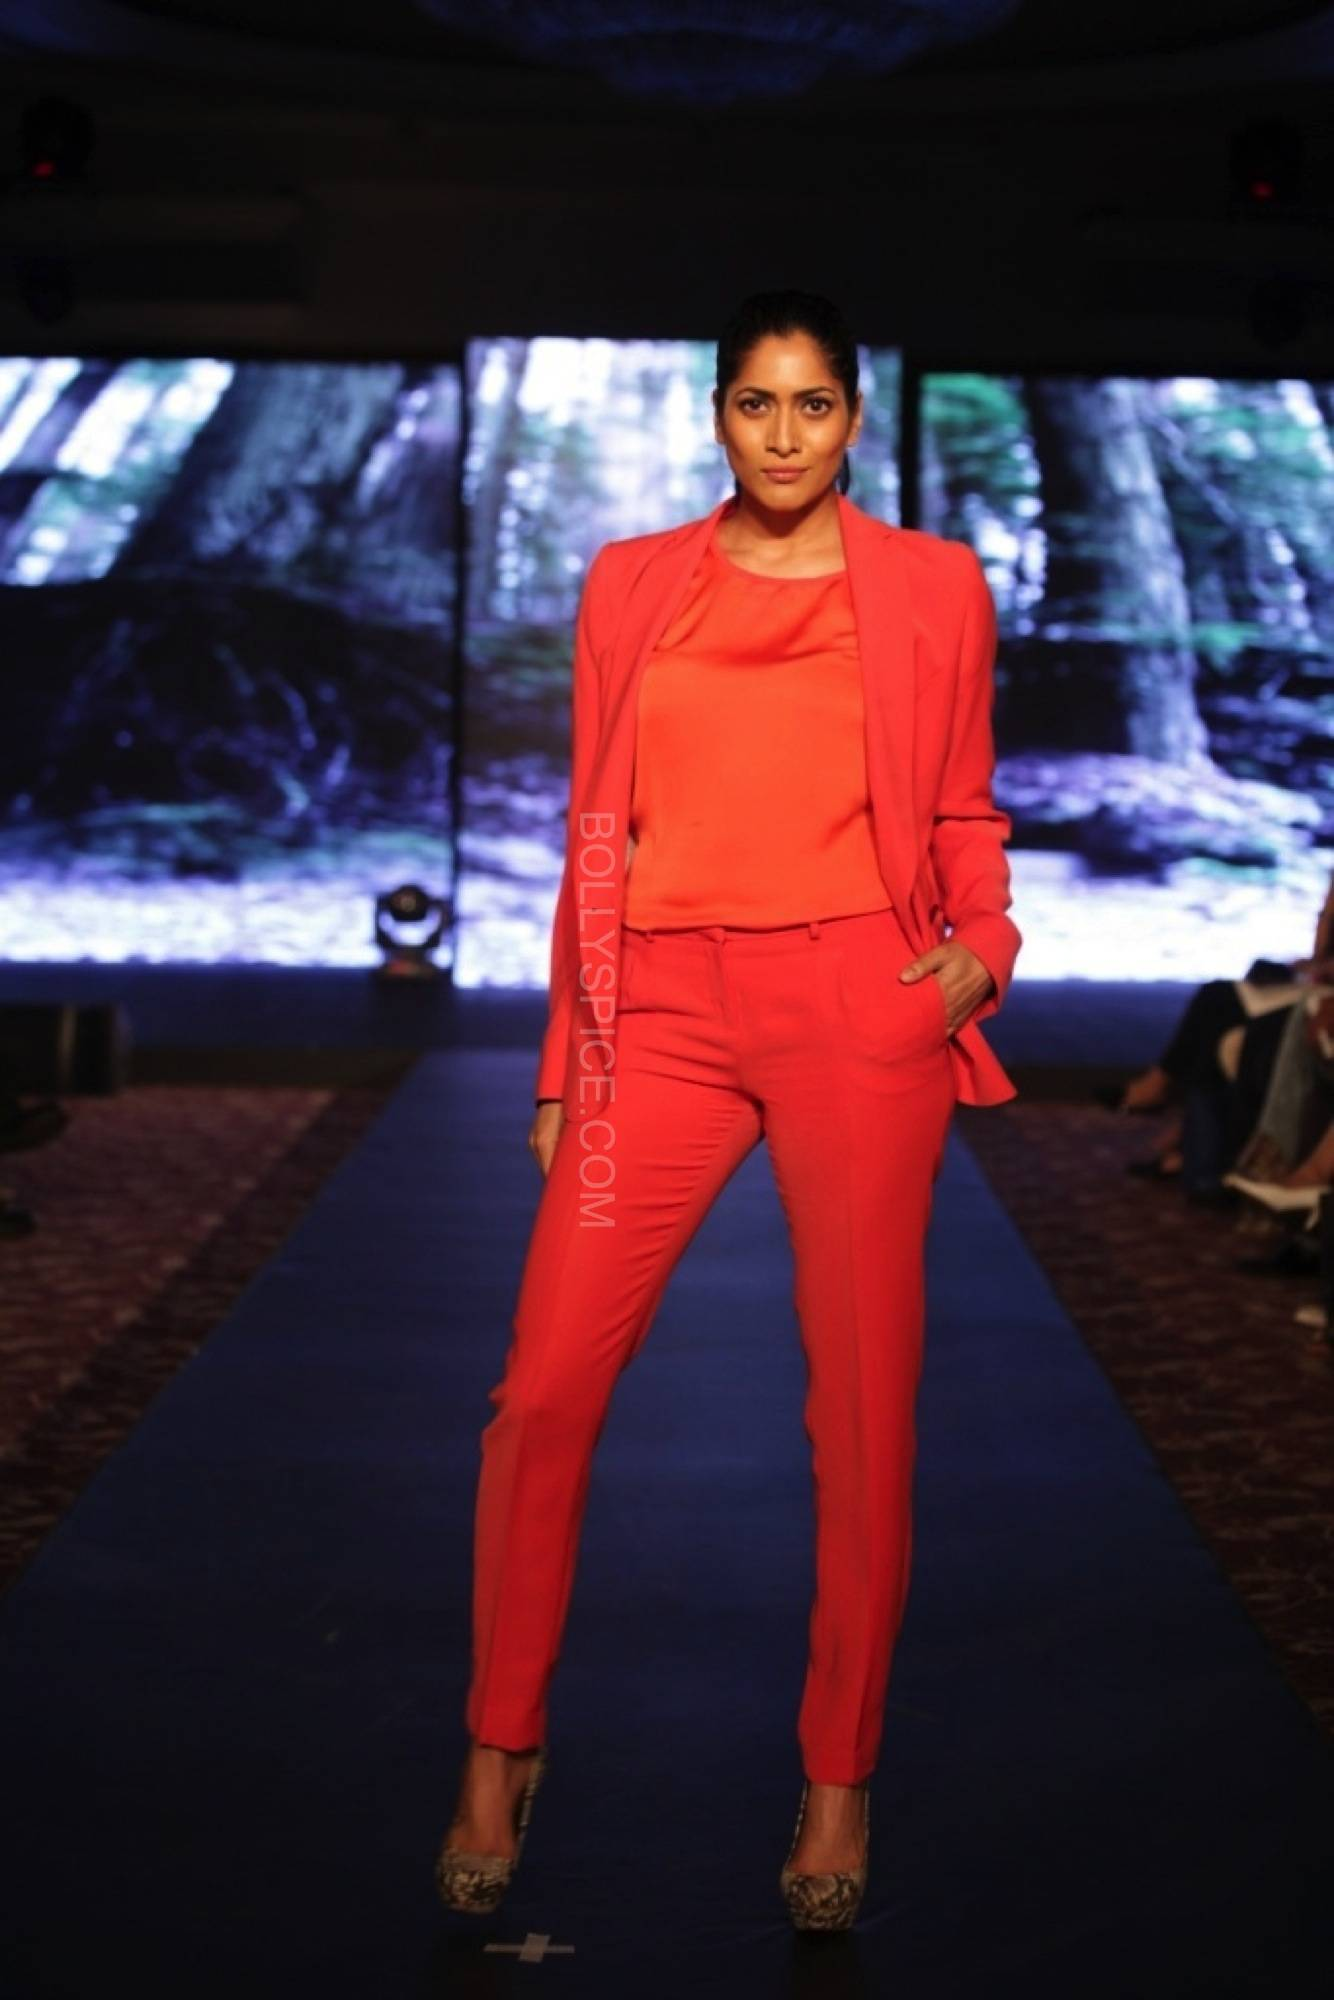 deepikapadukonefanfadhionshow8 Deepika Padukones Fans Fashion Show for Van Heusen